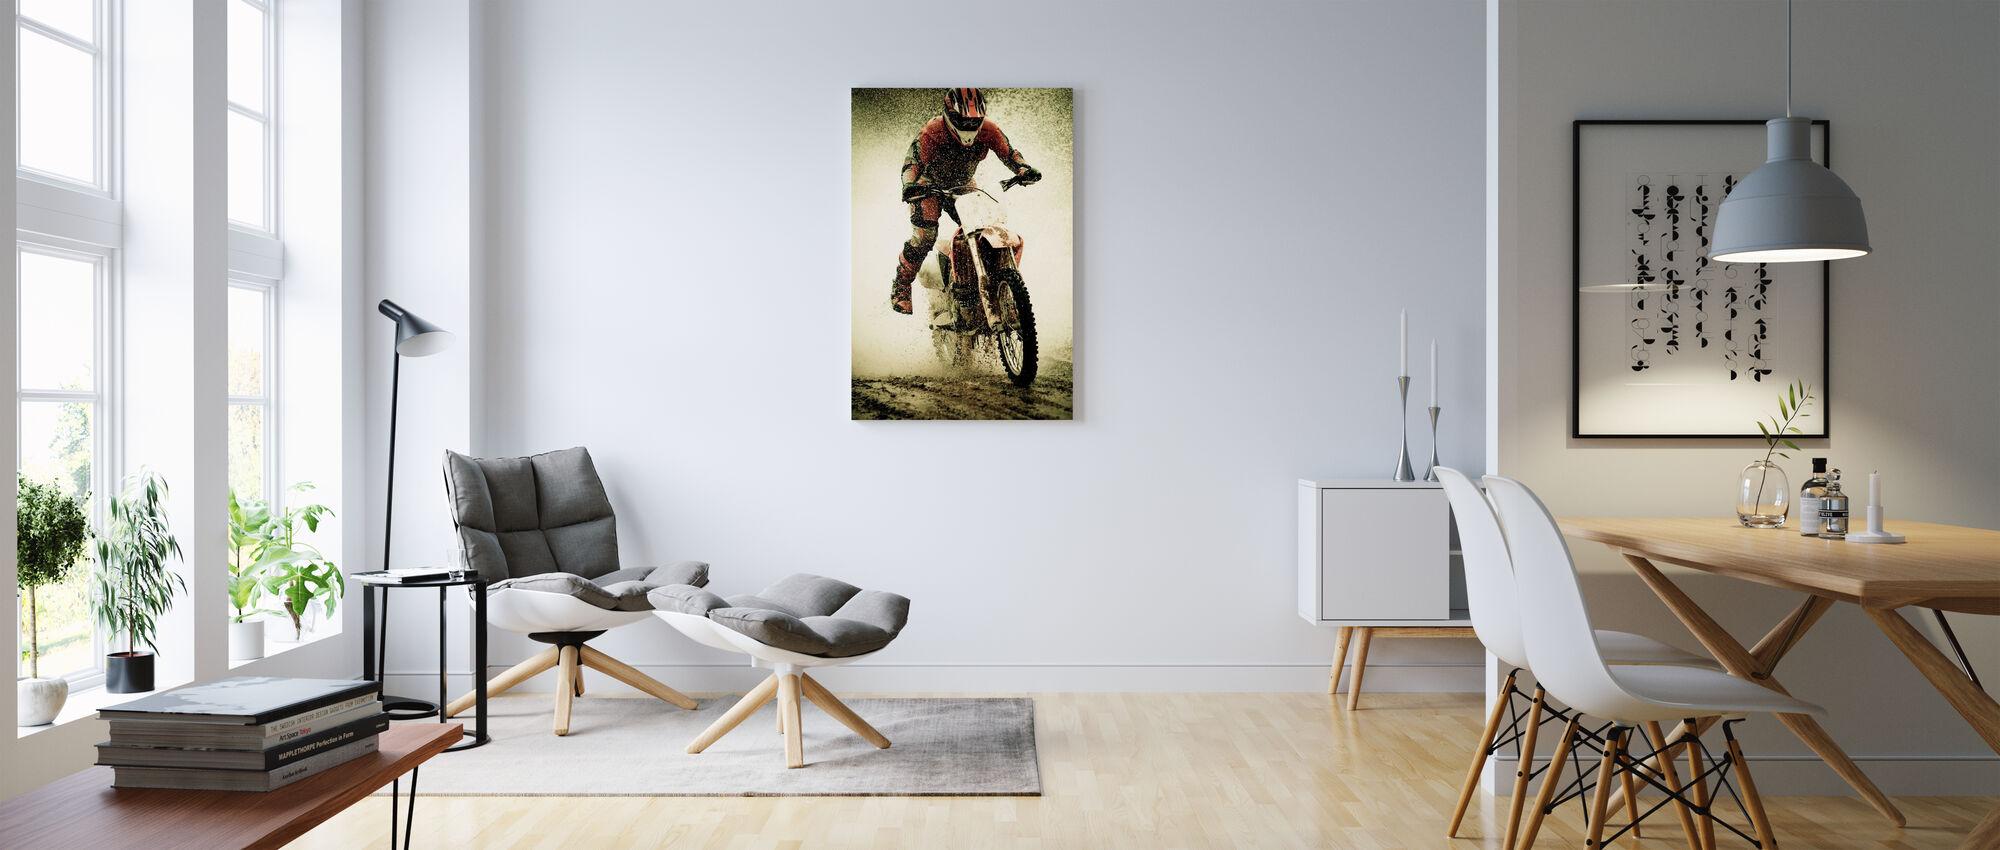 Motocross - Lerretsbilde - Stue